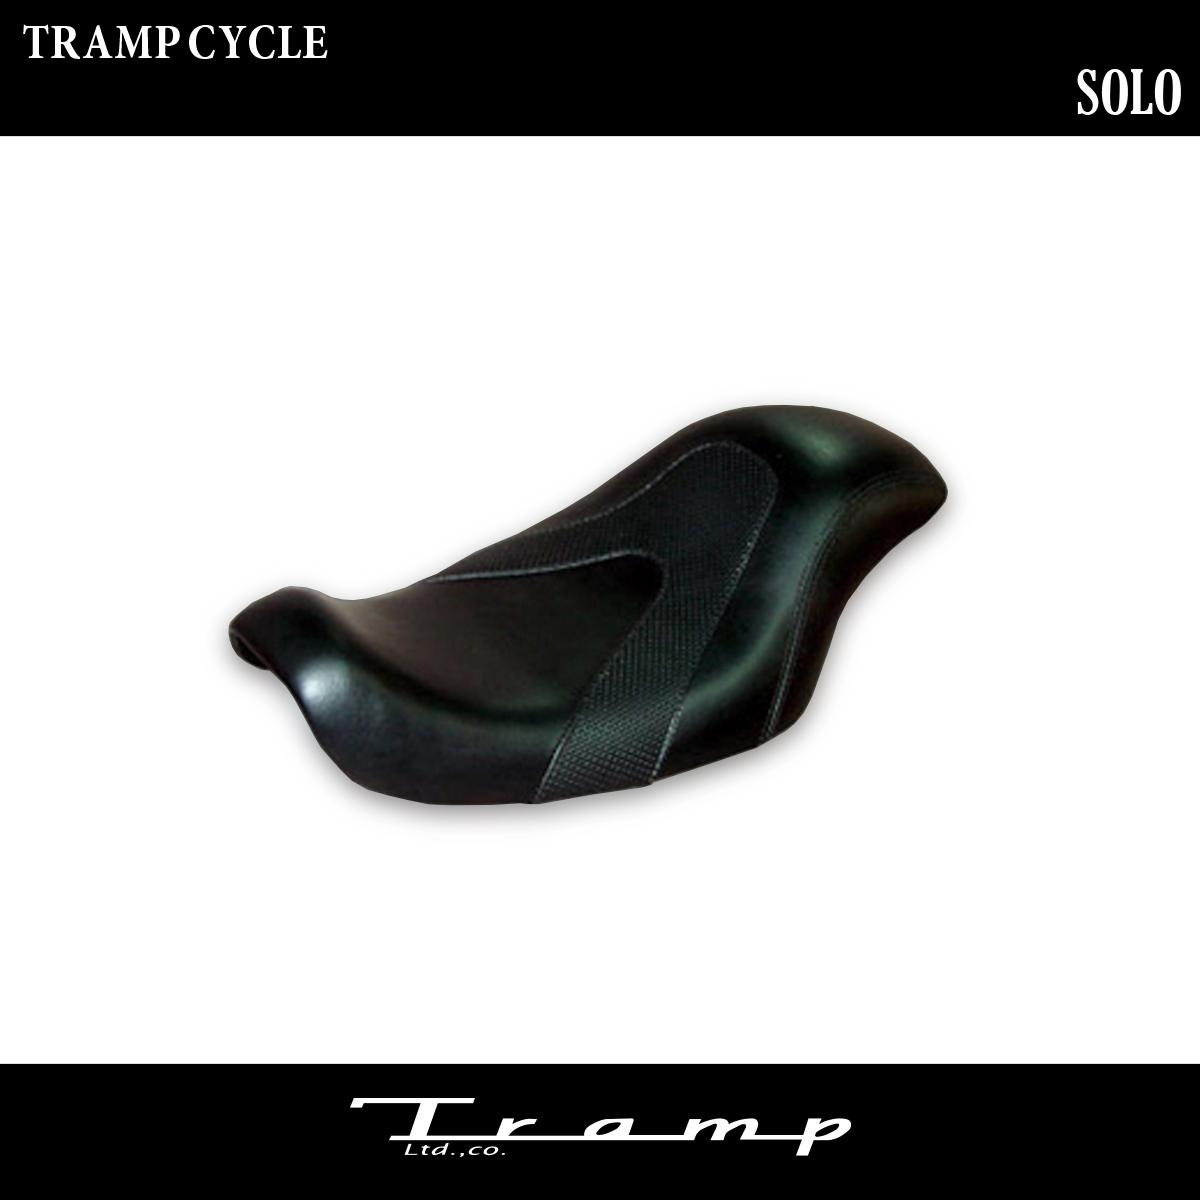 TRAMP CYCLE トランプサイクル / ソロシート (着座位置前) 【TSS-008C】スポーツスター 07~09年 ワイドタンクモデル用 / ハーレーダビッドソン 社外品 HARLEY DAVIDSON 送料無料